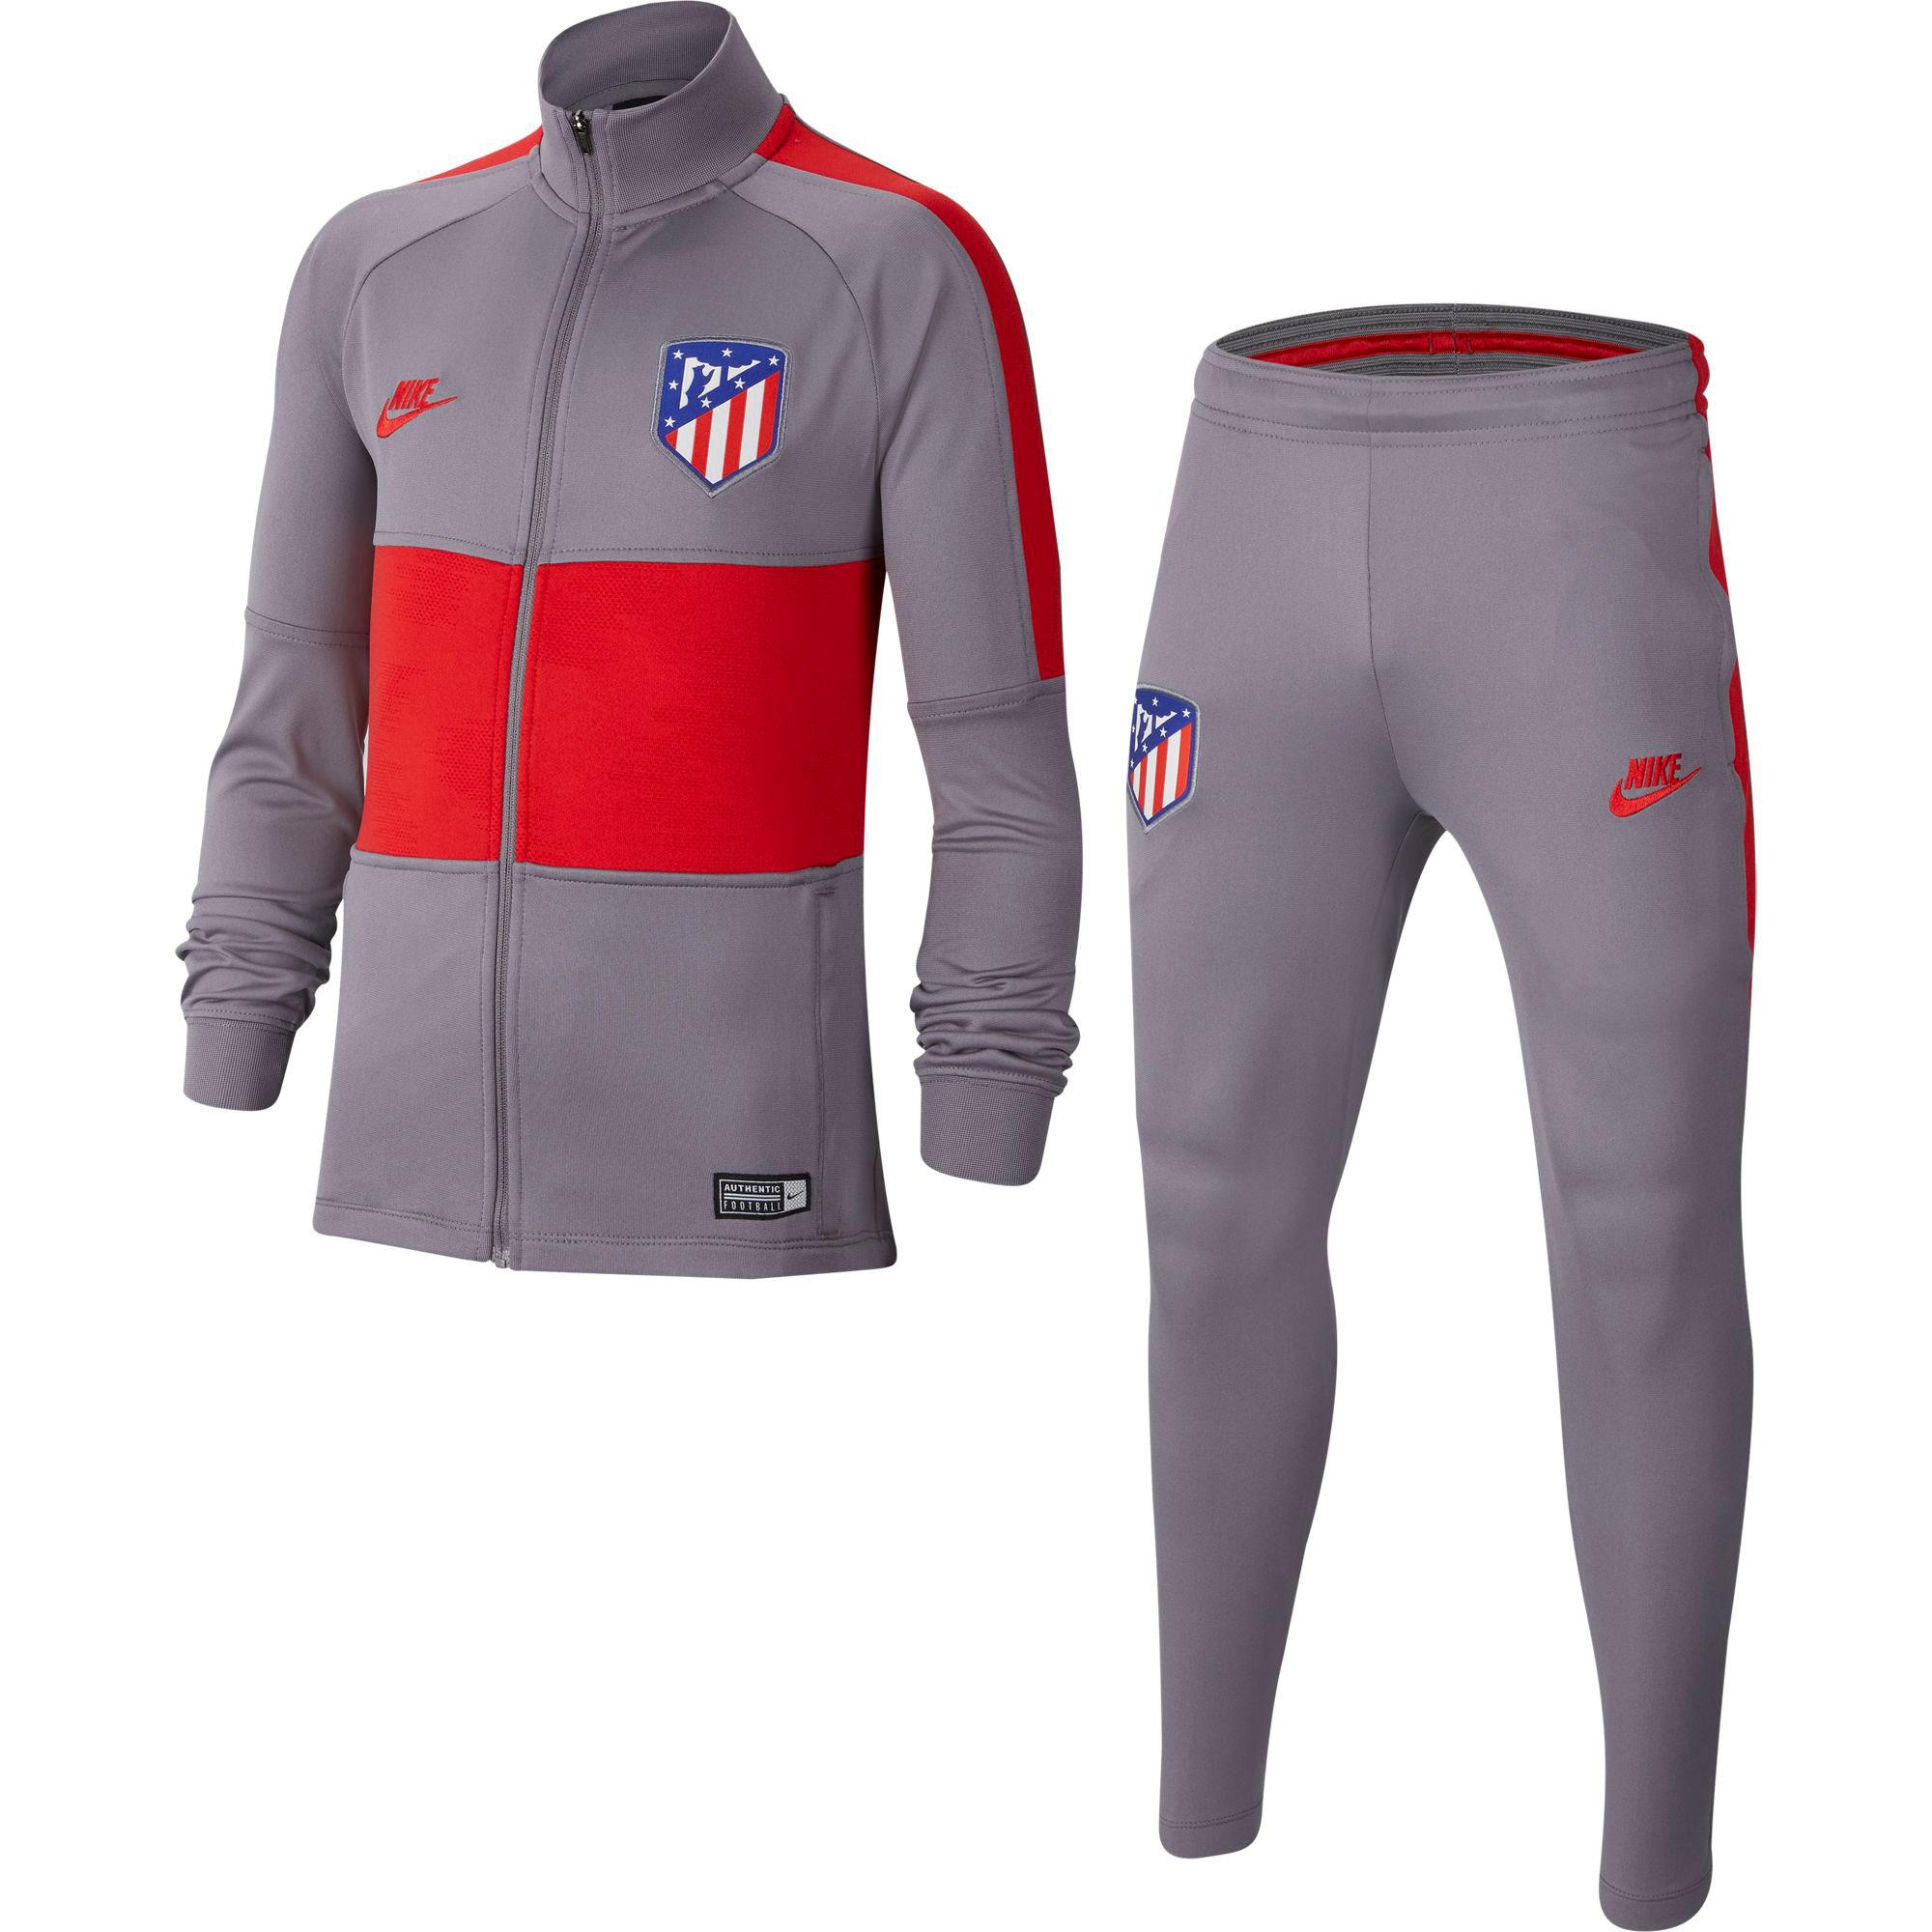 Nike / Chándal Dry Strike del Atlético de Madrid para niño